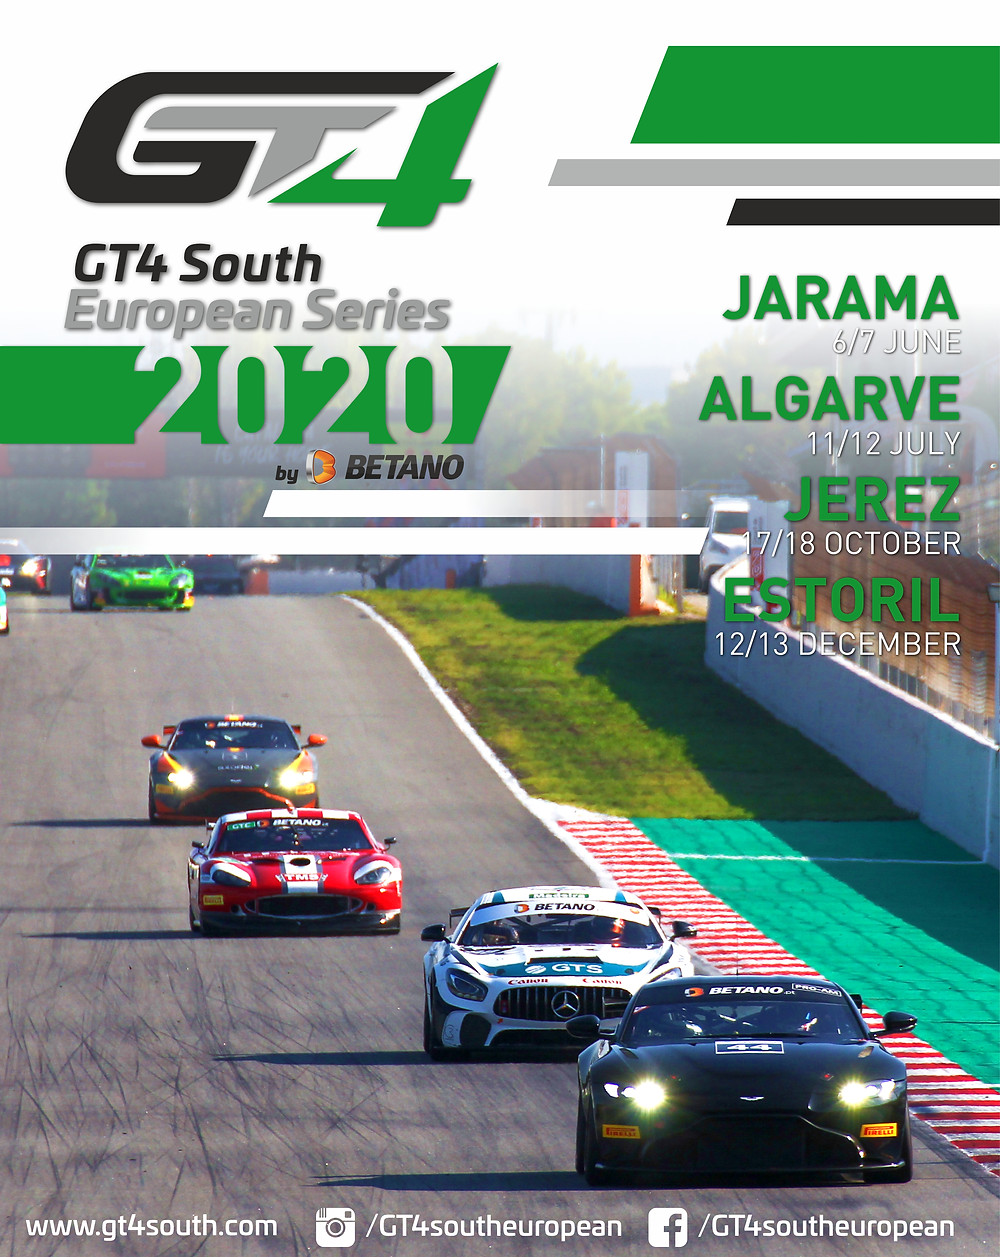 GT4 South European 2020 calendar